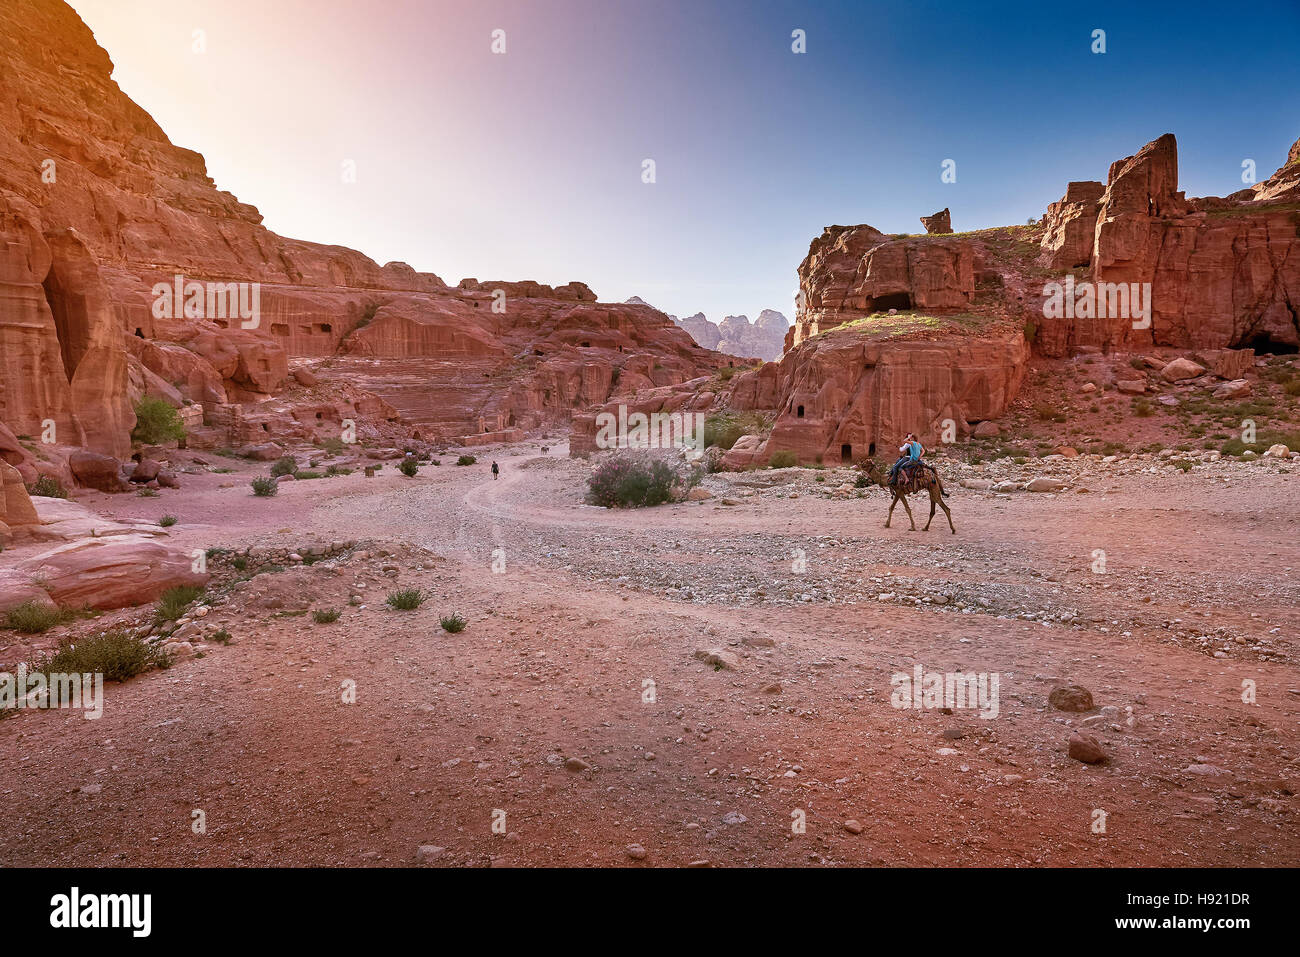 Antica città di Petra, Giordania Immagini Stock